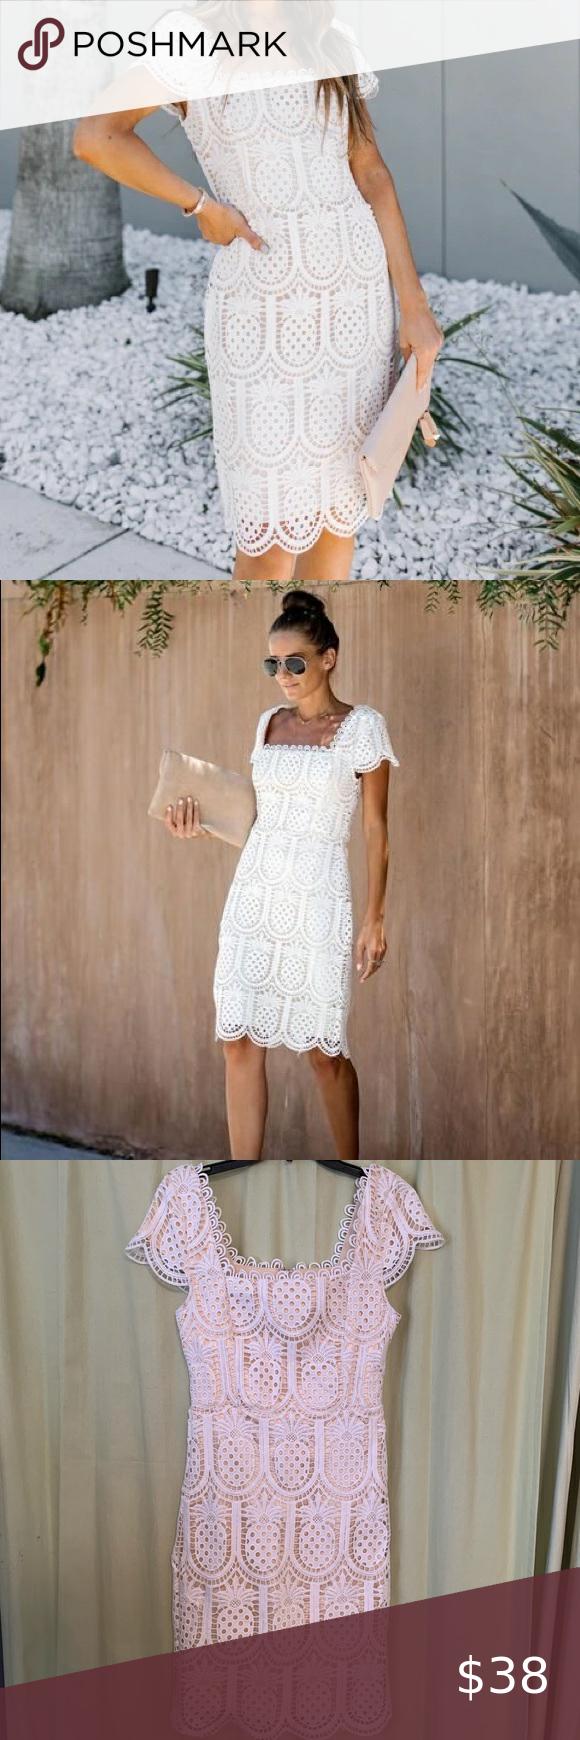 Vici White Pineapple Print Eyelet Dress Eyelet Dress Dresses Vici Dress [ 1740 x 580 Pixel ]